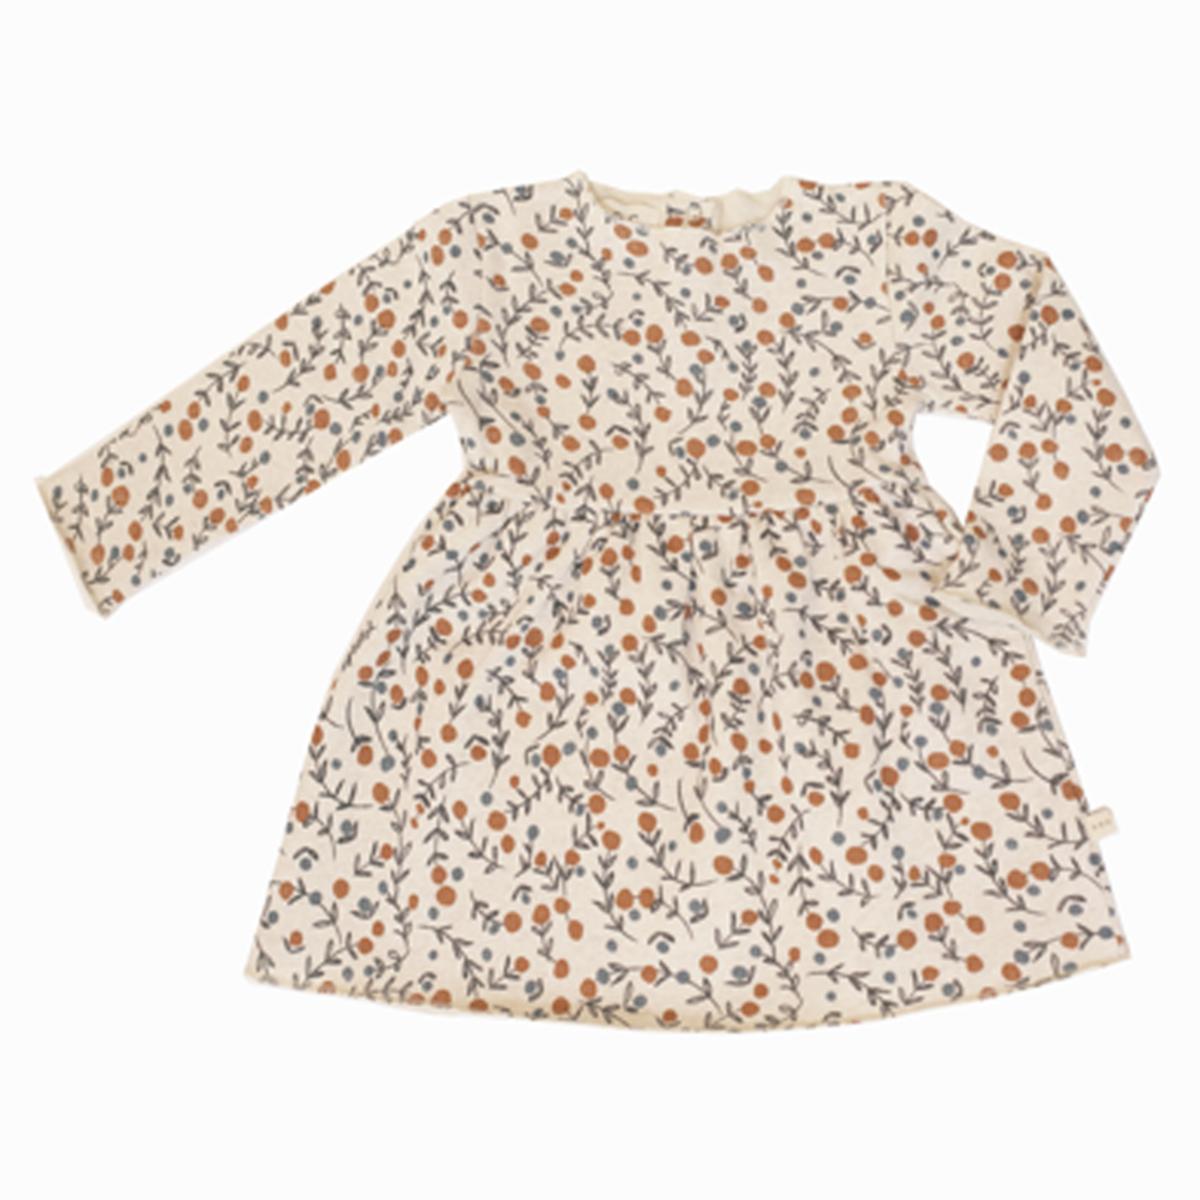 Robe & combinaison Robe Robyn Crème et Petites Fleurs - 18 Mois Robe Robyn Crème et Petites Fleurs - 18 Mois